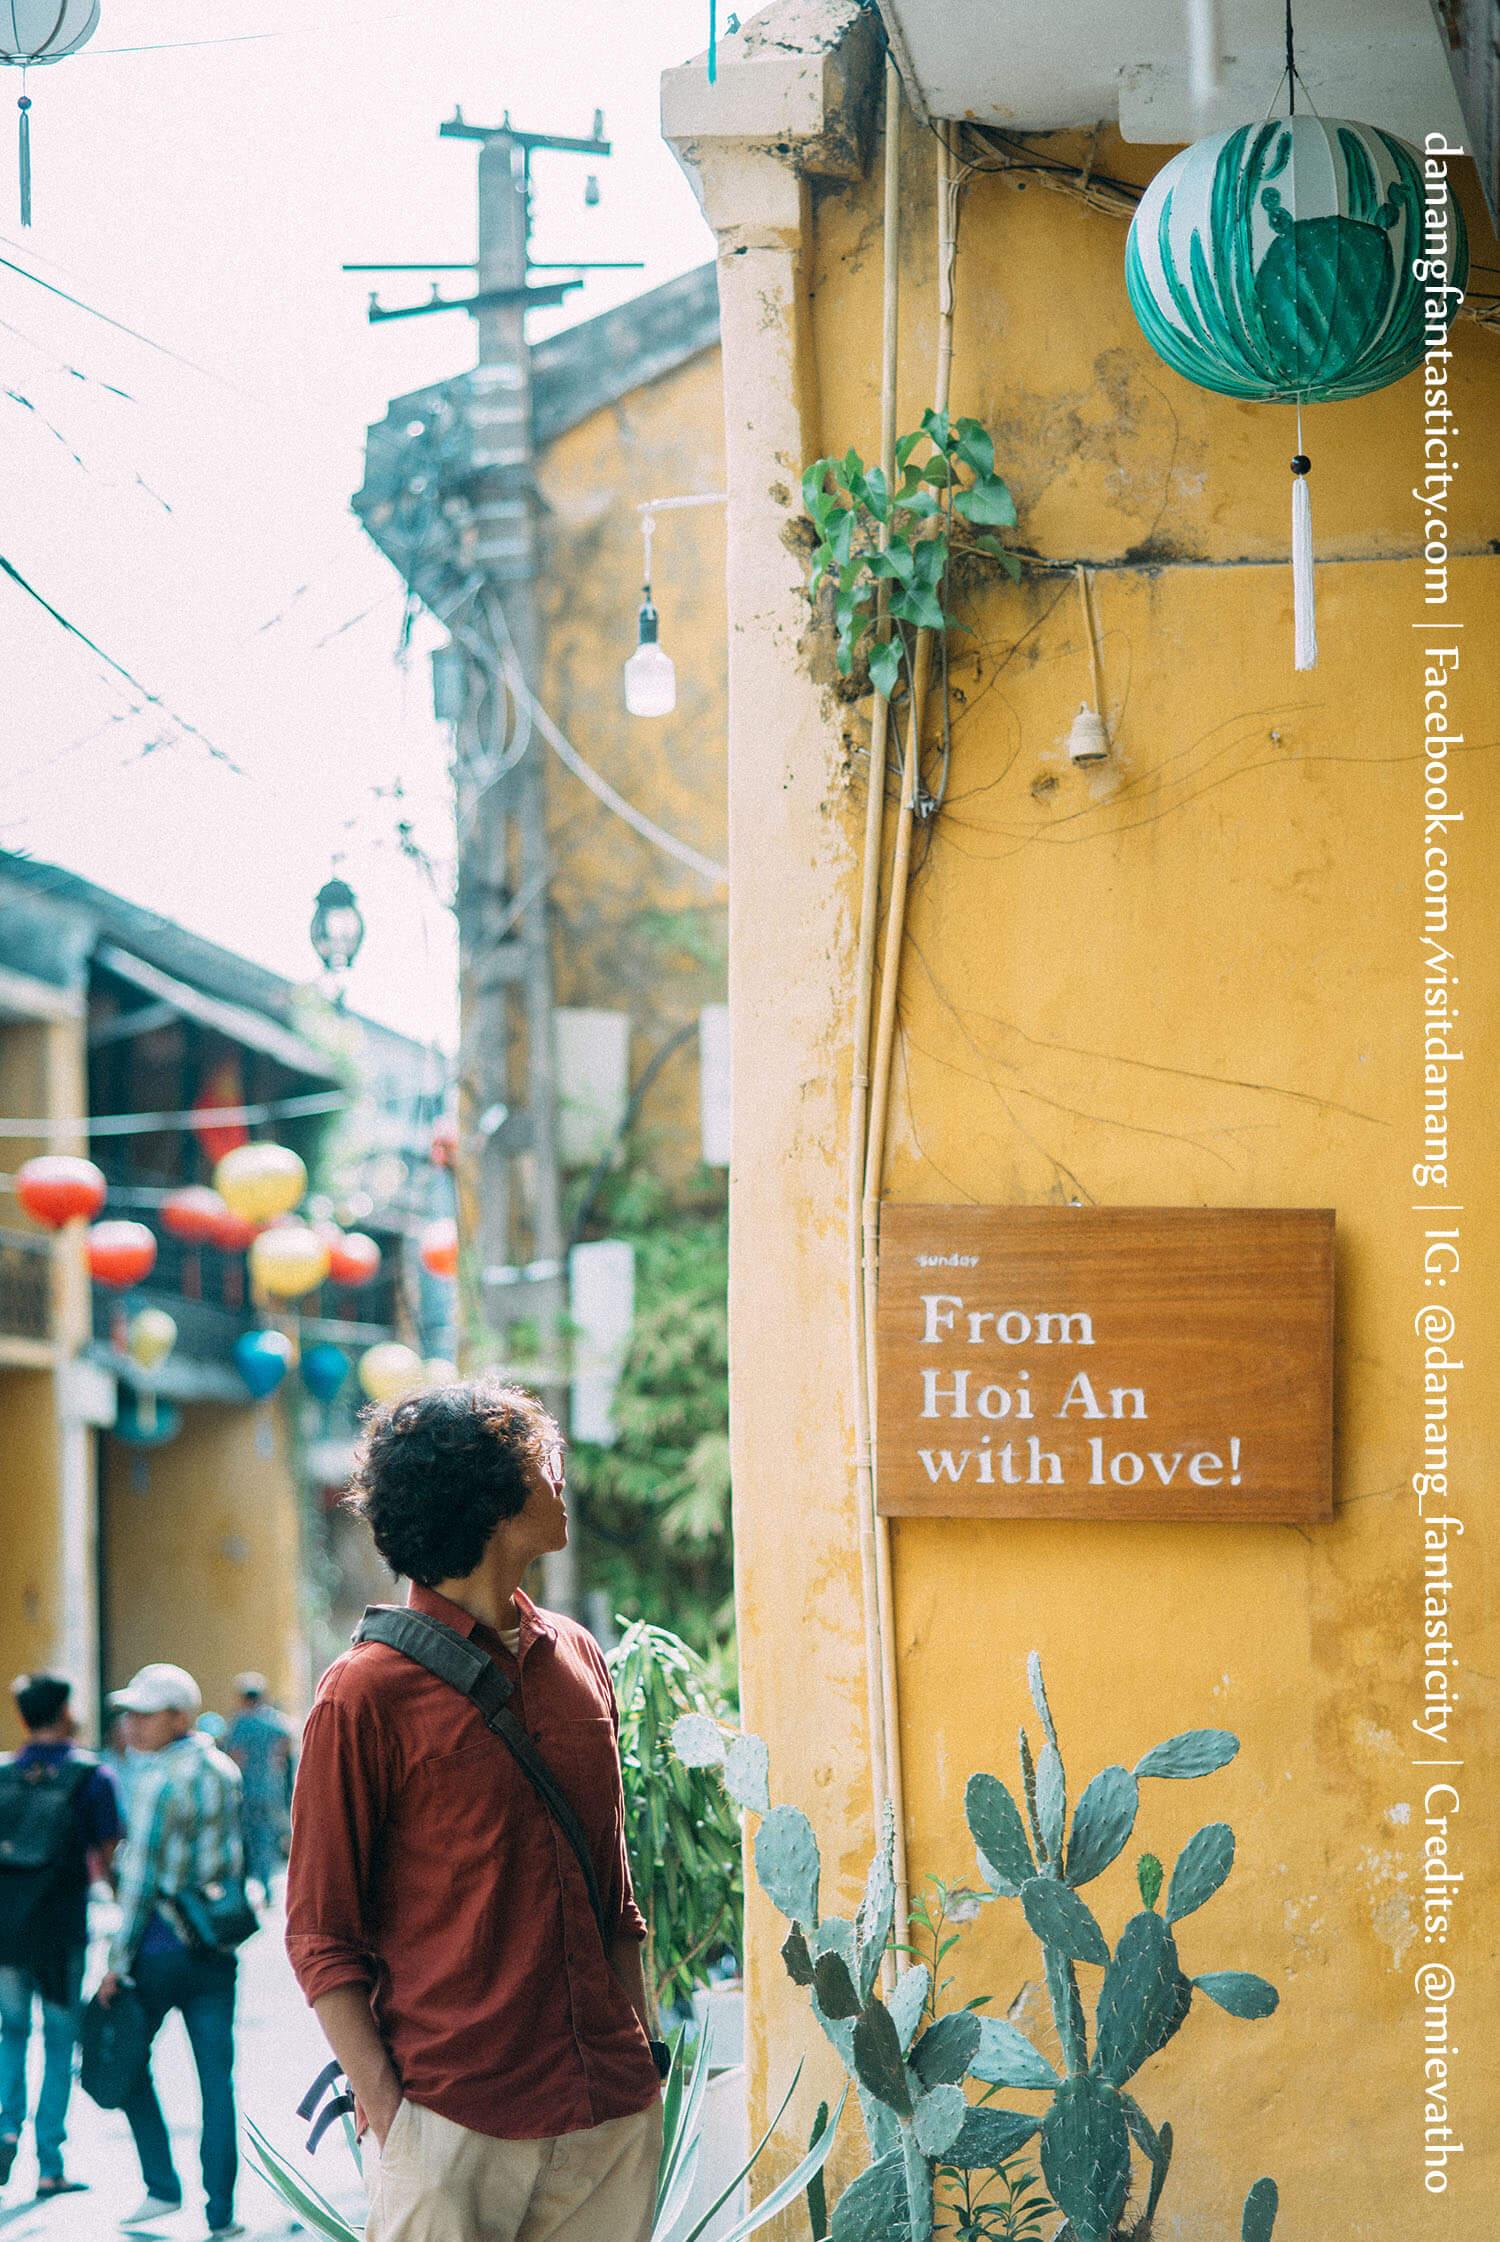 Da Nang Hoi An Anh Cho Minh Tren Chiec Xe Giac Mo Mievatho Danang Fantasticity Com 020